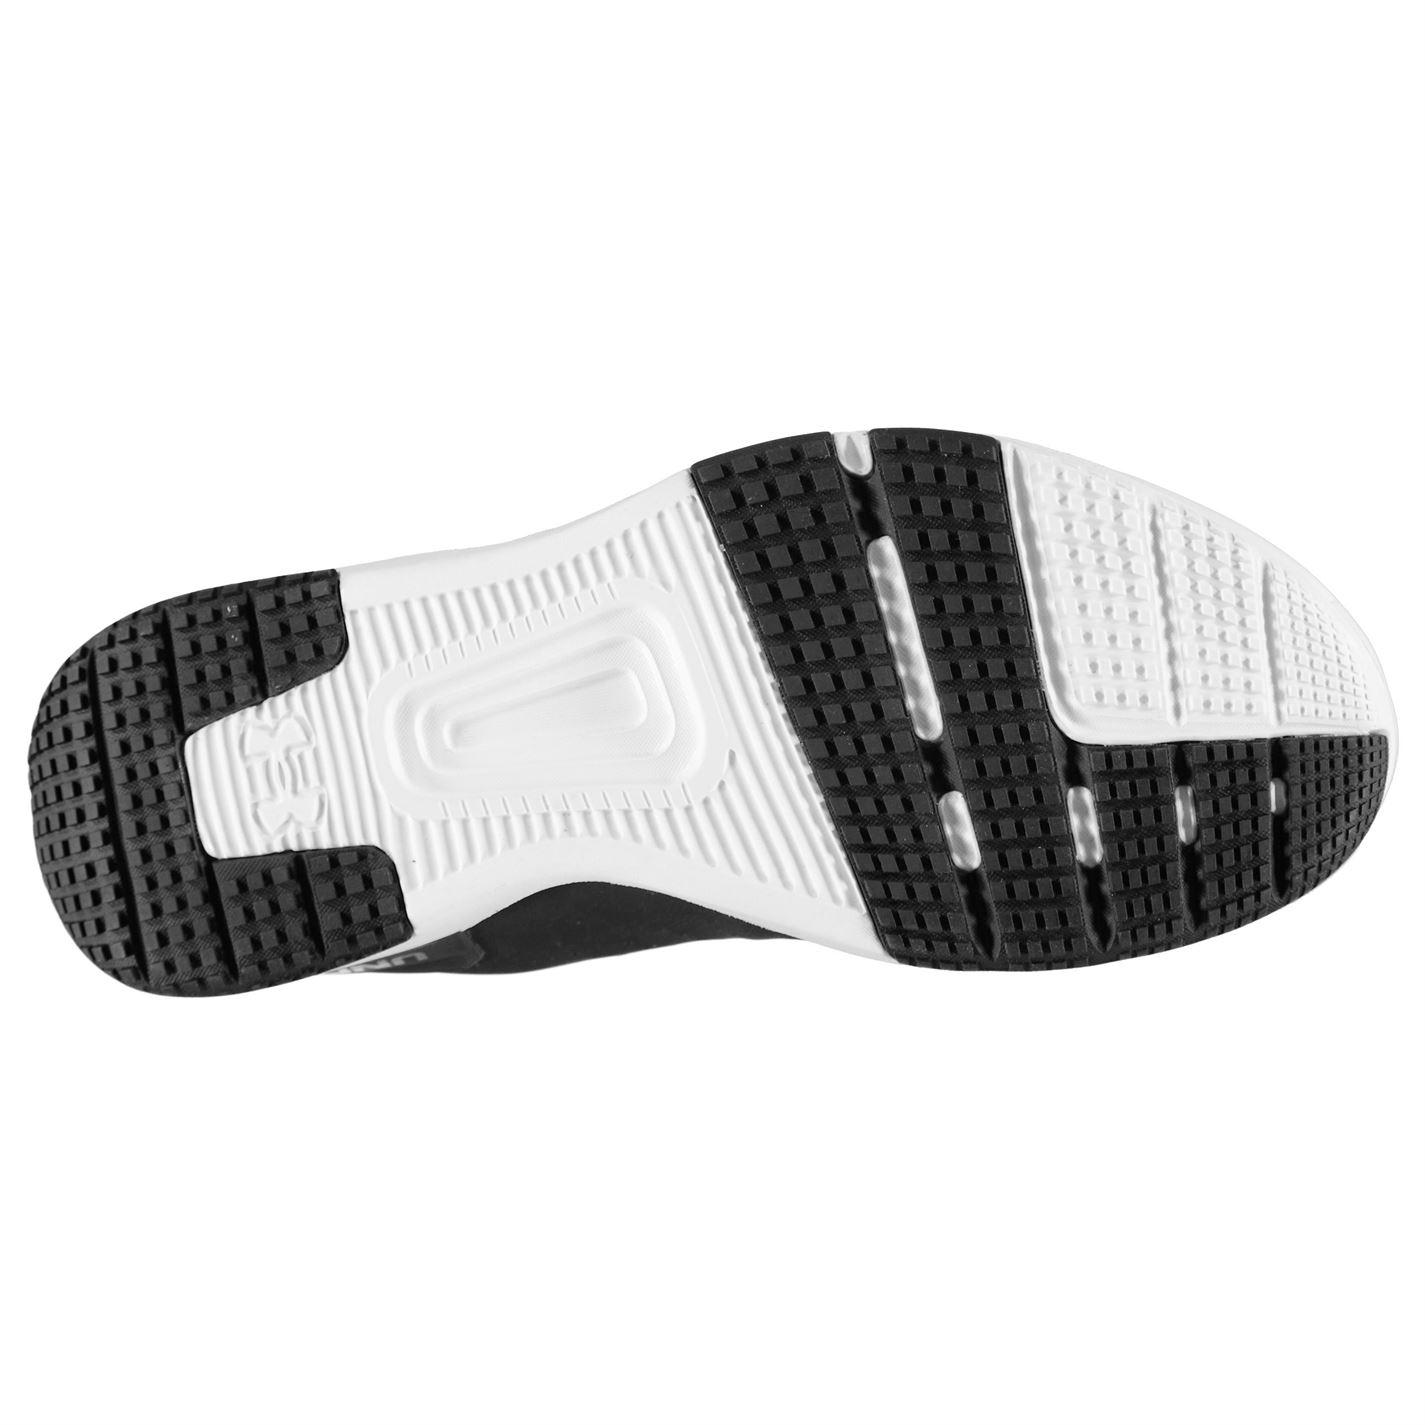 Armour deporte Limitless Under 0 hombre 3 cordones de Deportes de Zapatillas Zapatillas para hombre para Negro twCq54I